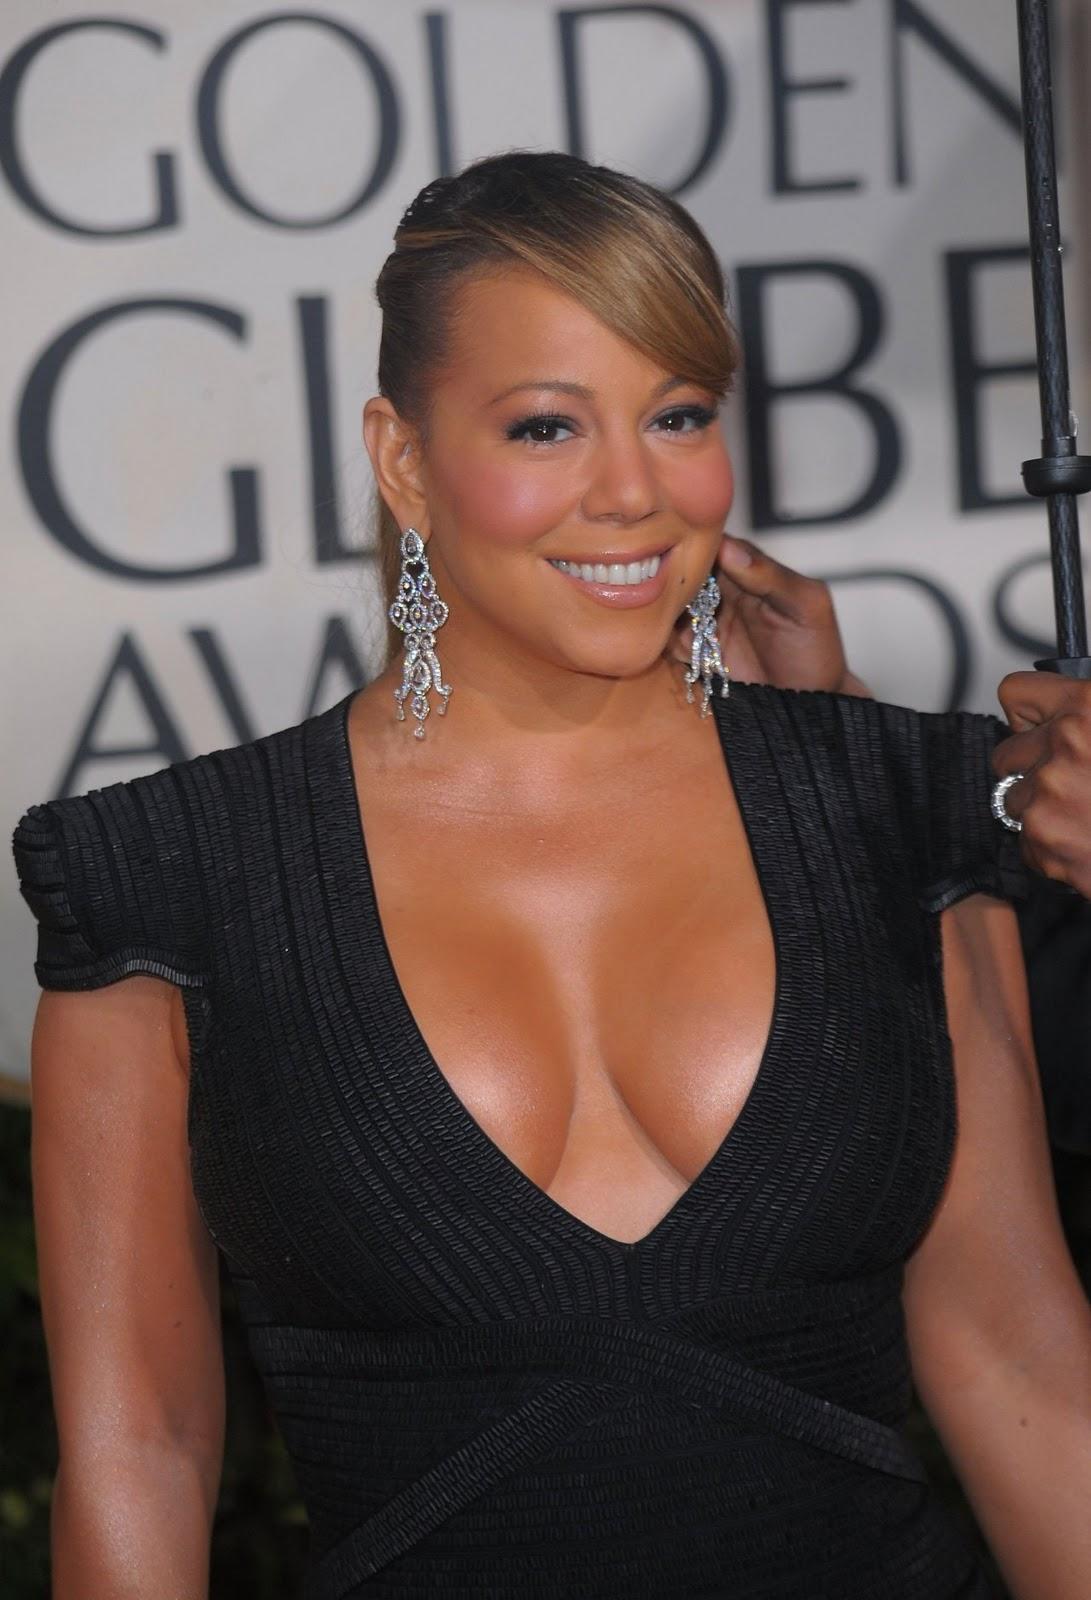 http://1.bp.blogspot.com/_aKvvh1lPLBU/TOPrNUcH9zI/AAAAAAAAAlI/hbCiYkPW8RE/s1600/Mariah-Carey-sexy-cleavage-1781820.jpg